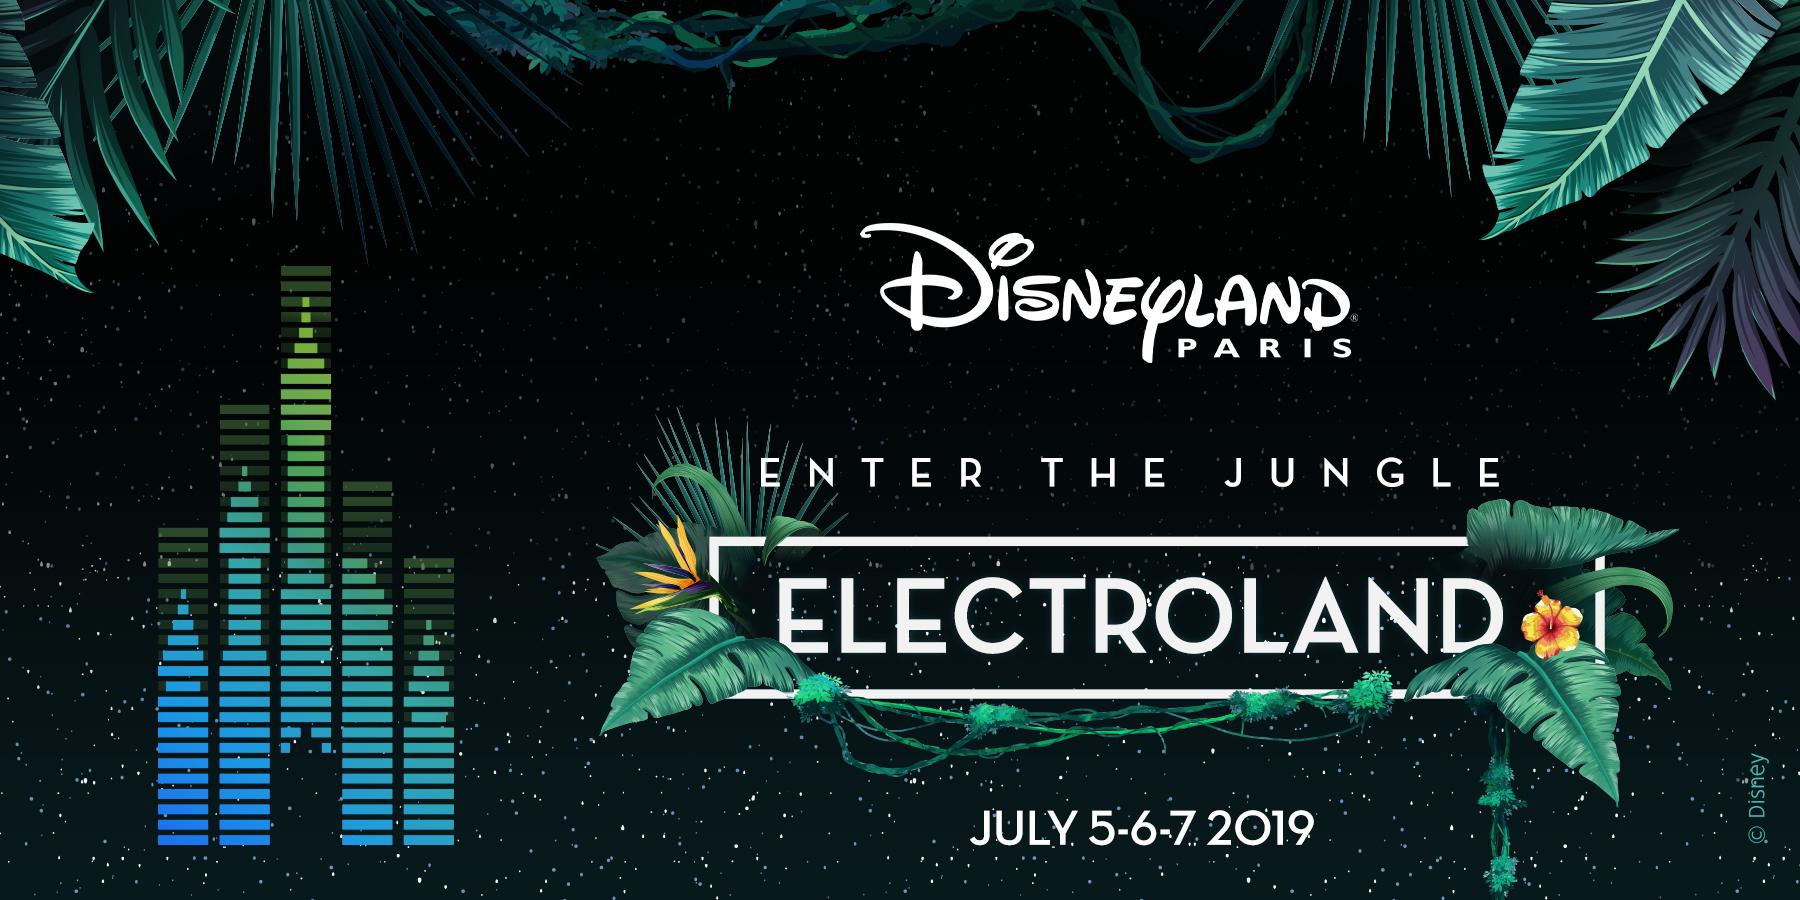 Disney Electroland 2019